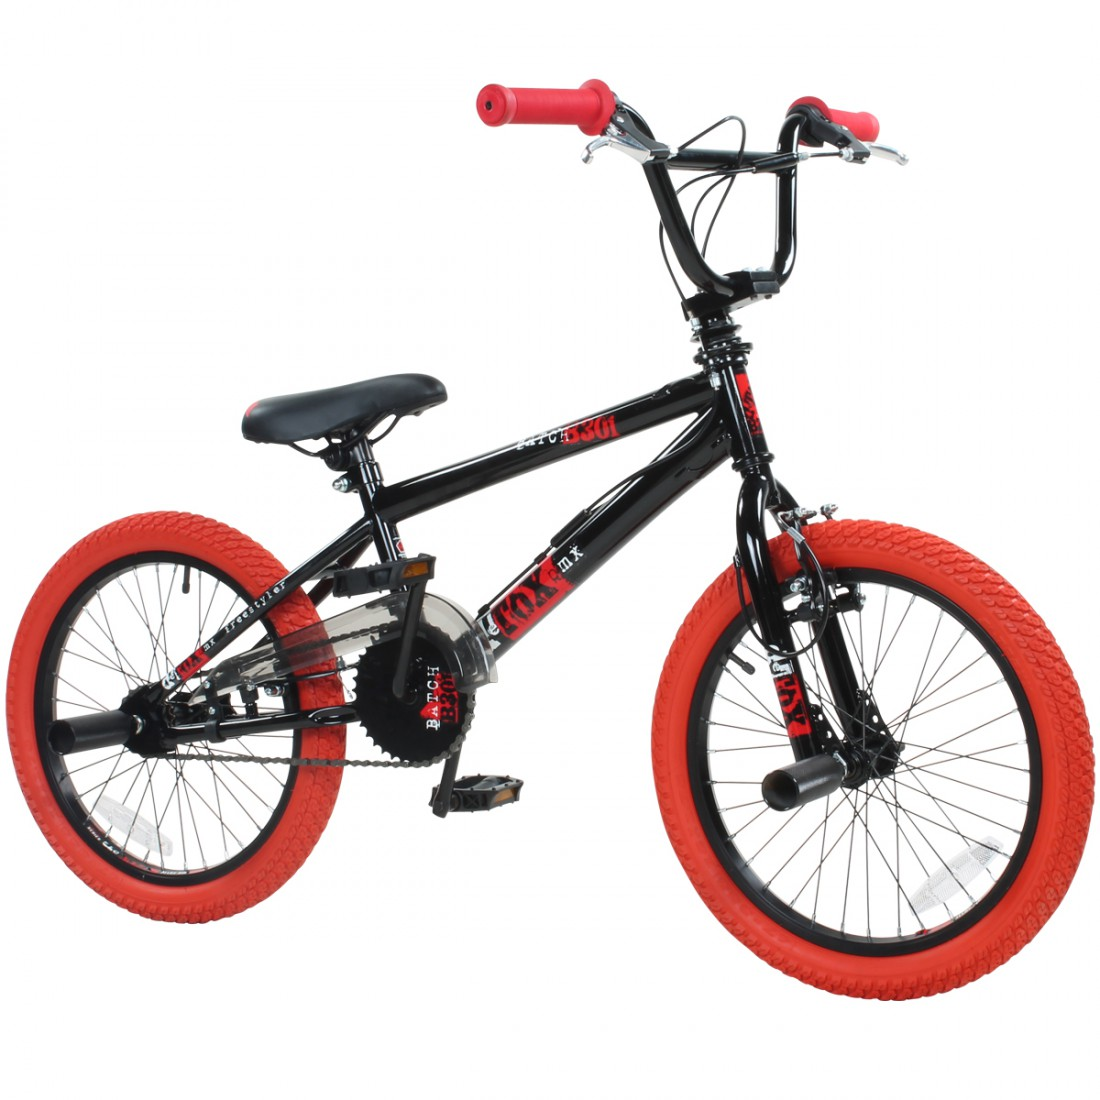 18 Pulgadas Bmx Bike Bicicleta Freestyle de Niños Niño Rueda Detox ...